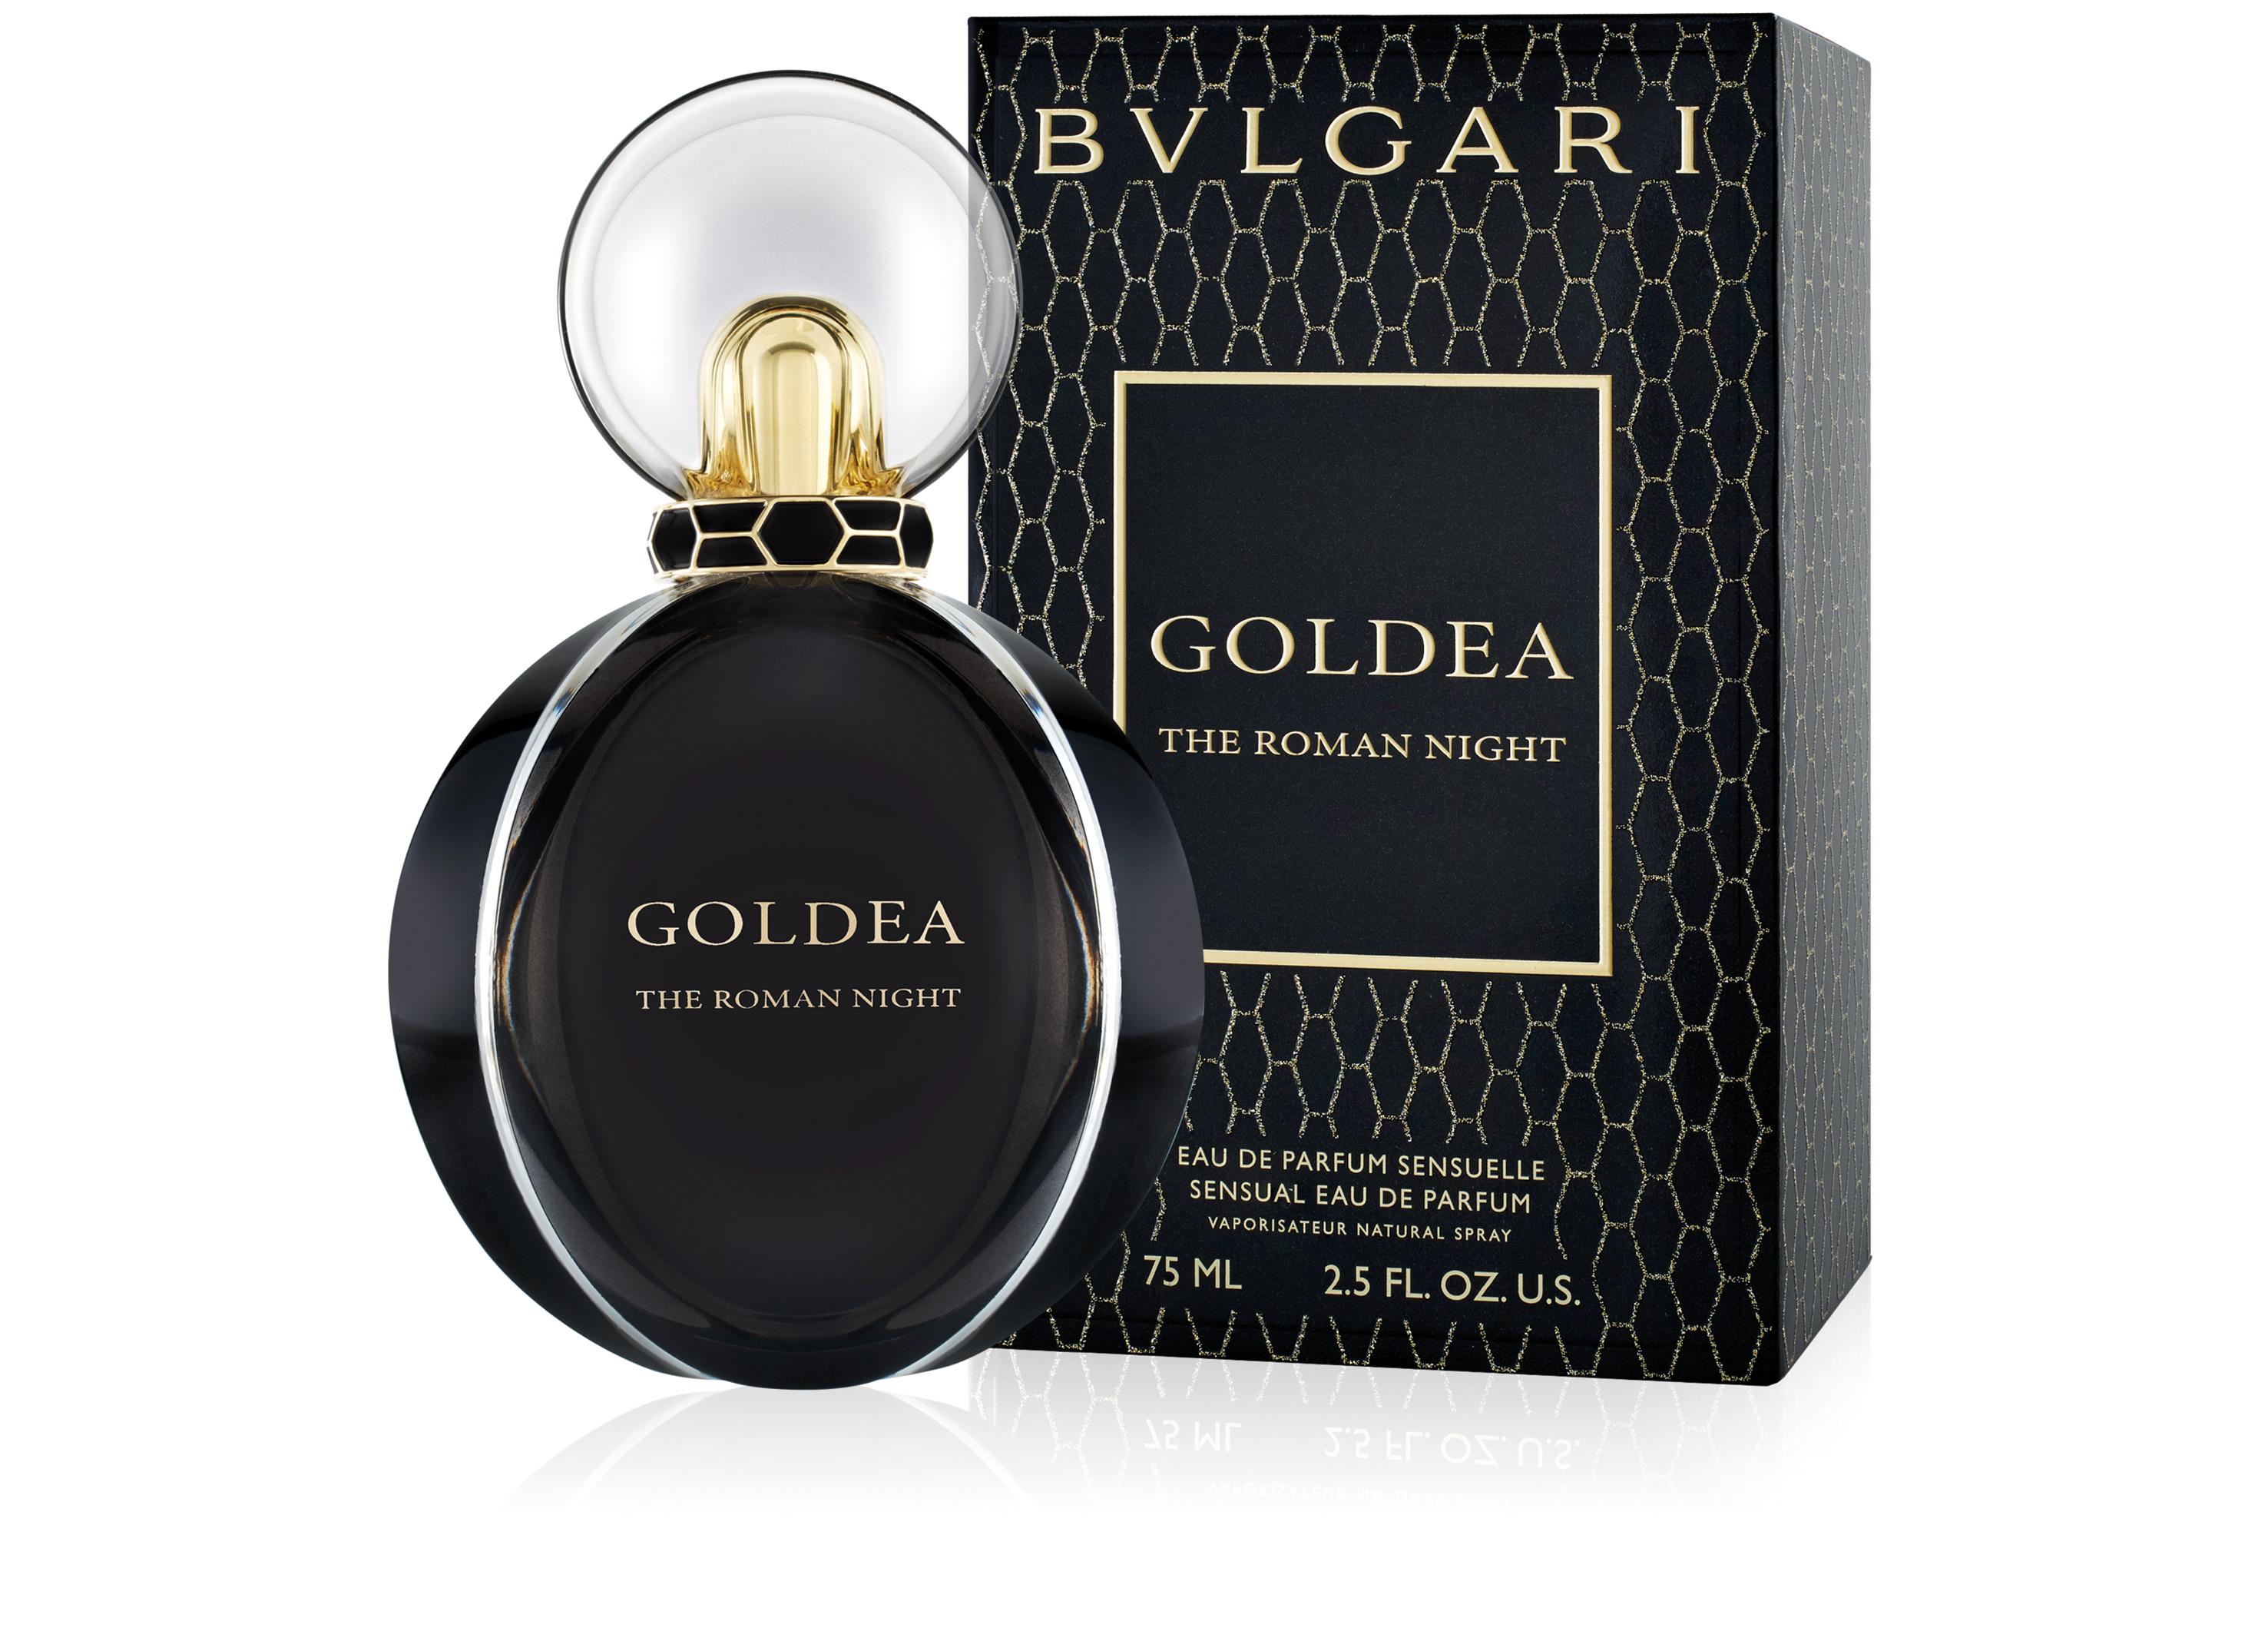 Goldea The Roman Night 75 ml with box